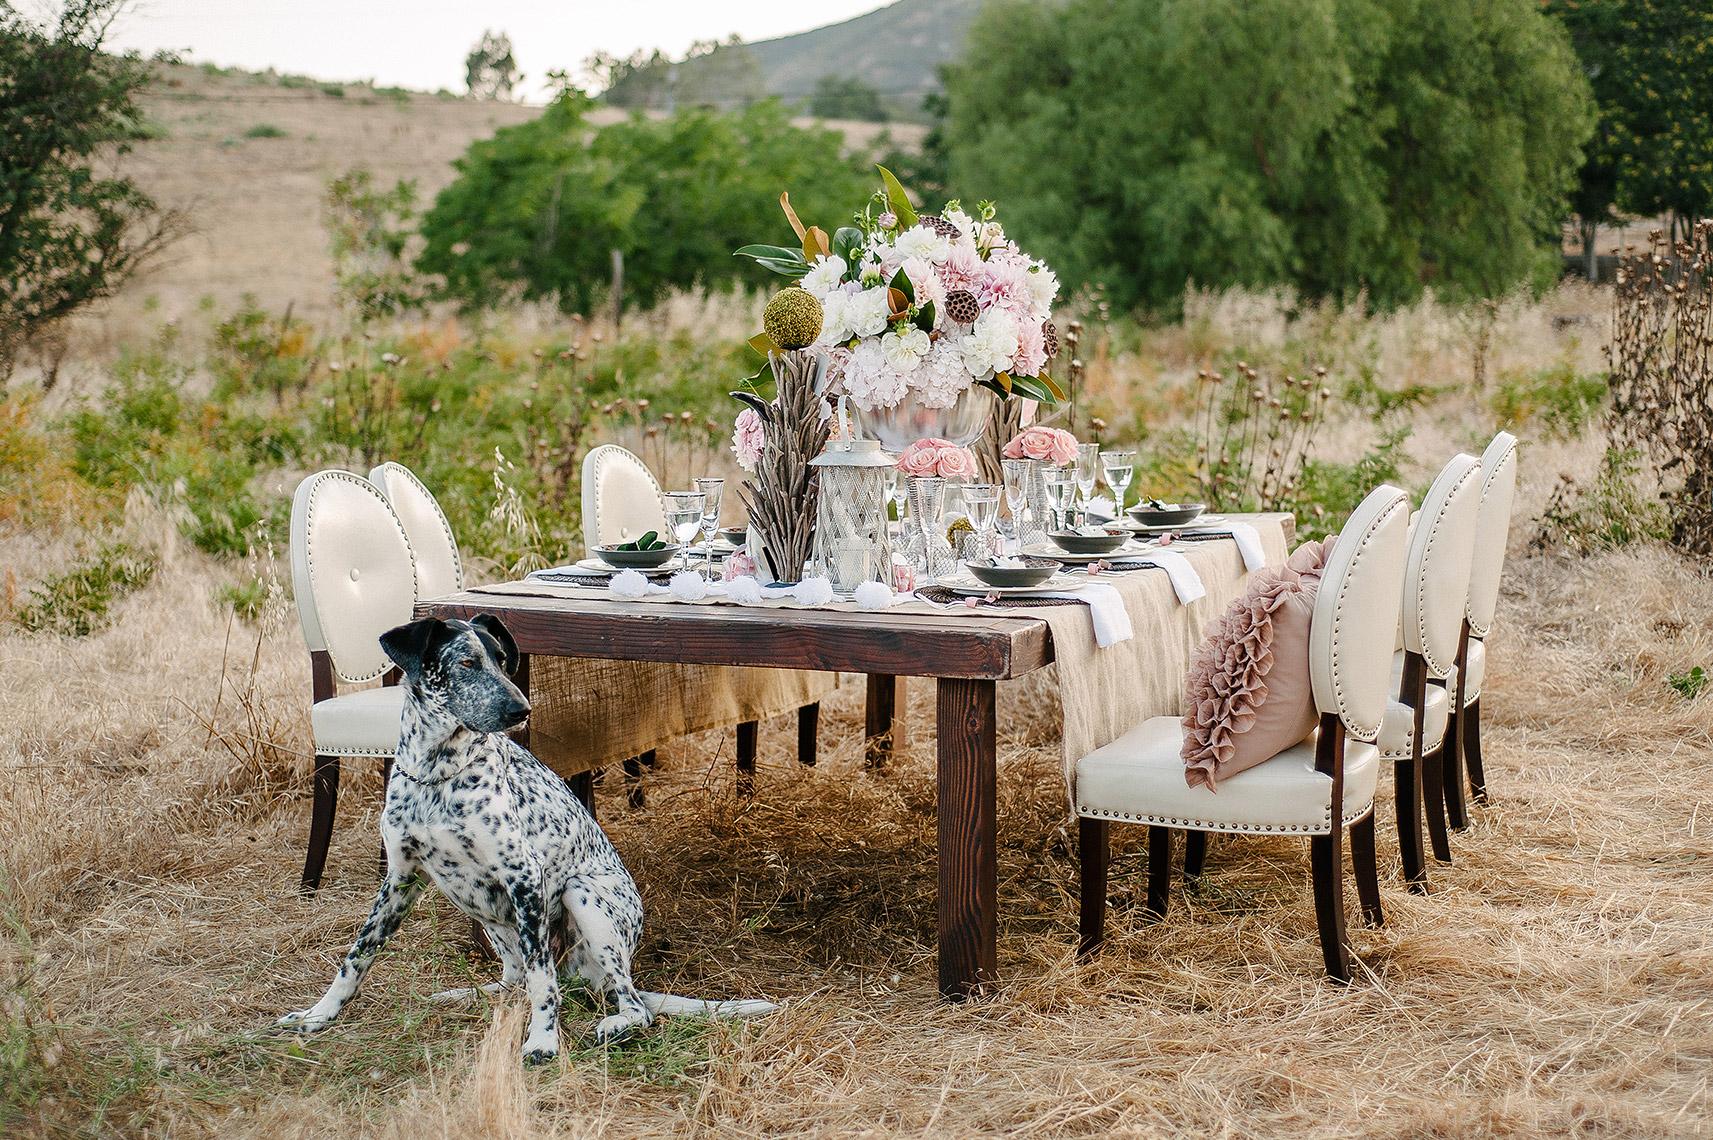 john-schnack-photography-san-diego-wedding-inspiration-shoot-back-country-vintage-wedding-24.jpg